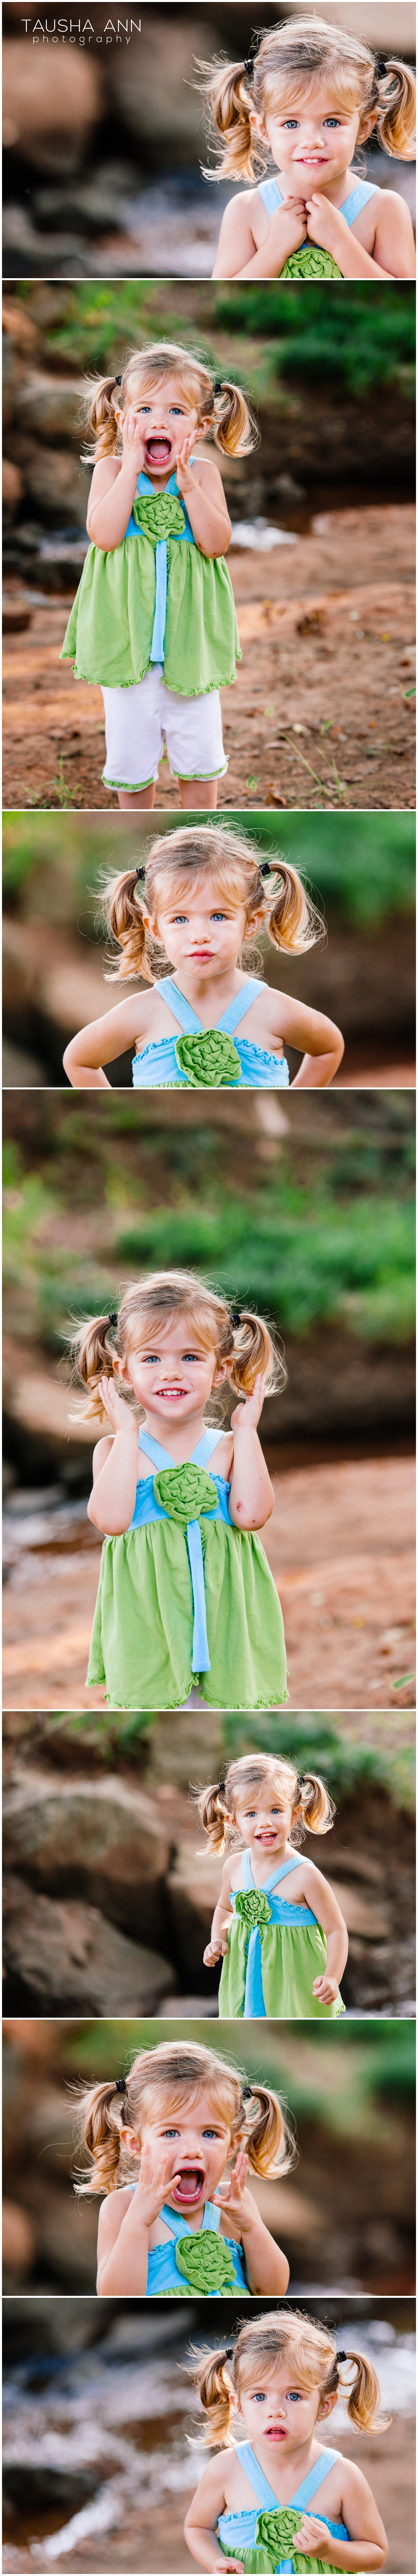 Dickinson_Family_2014_Tuscaloosa_Alabama_5